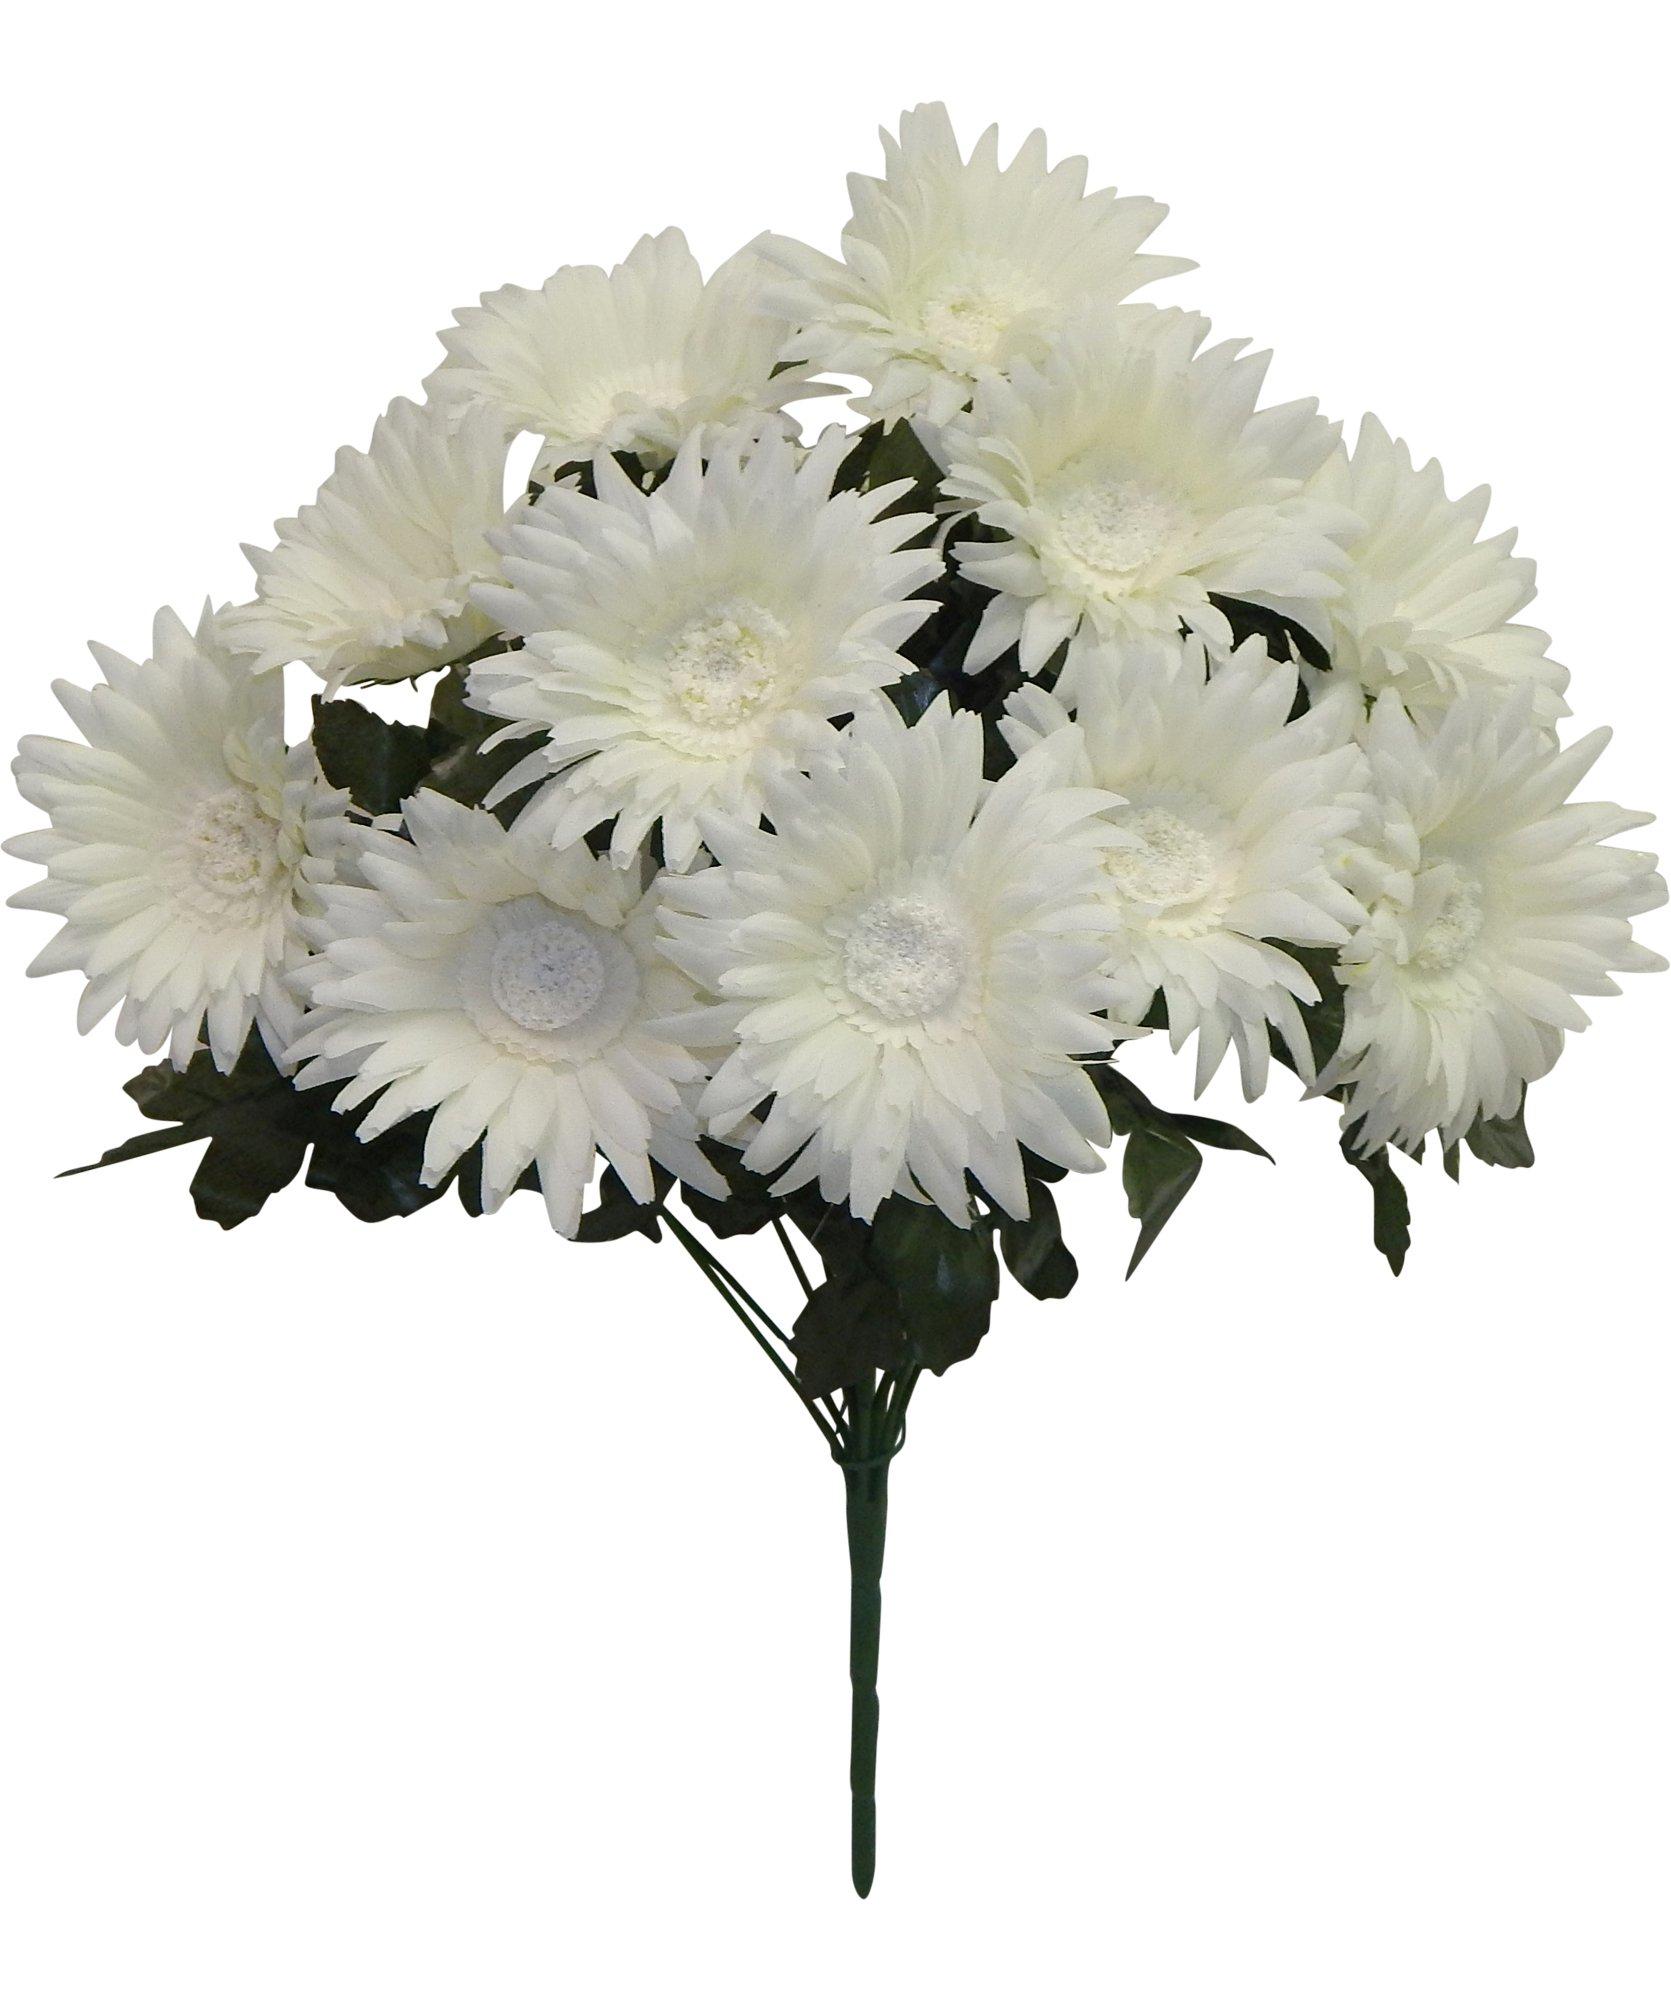 17-Gerbera-Daisy-Bush-Silk-Wedding-Flowers-Home-Party-Holiday-Decor-12-Daisies-Cream